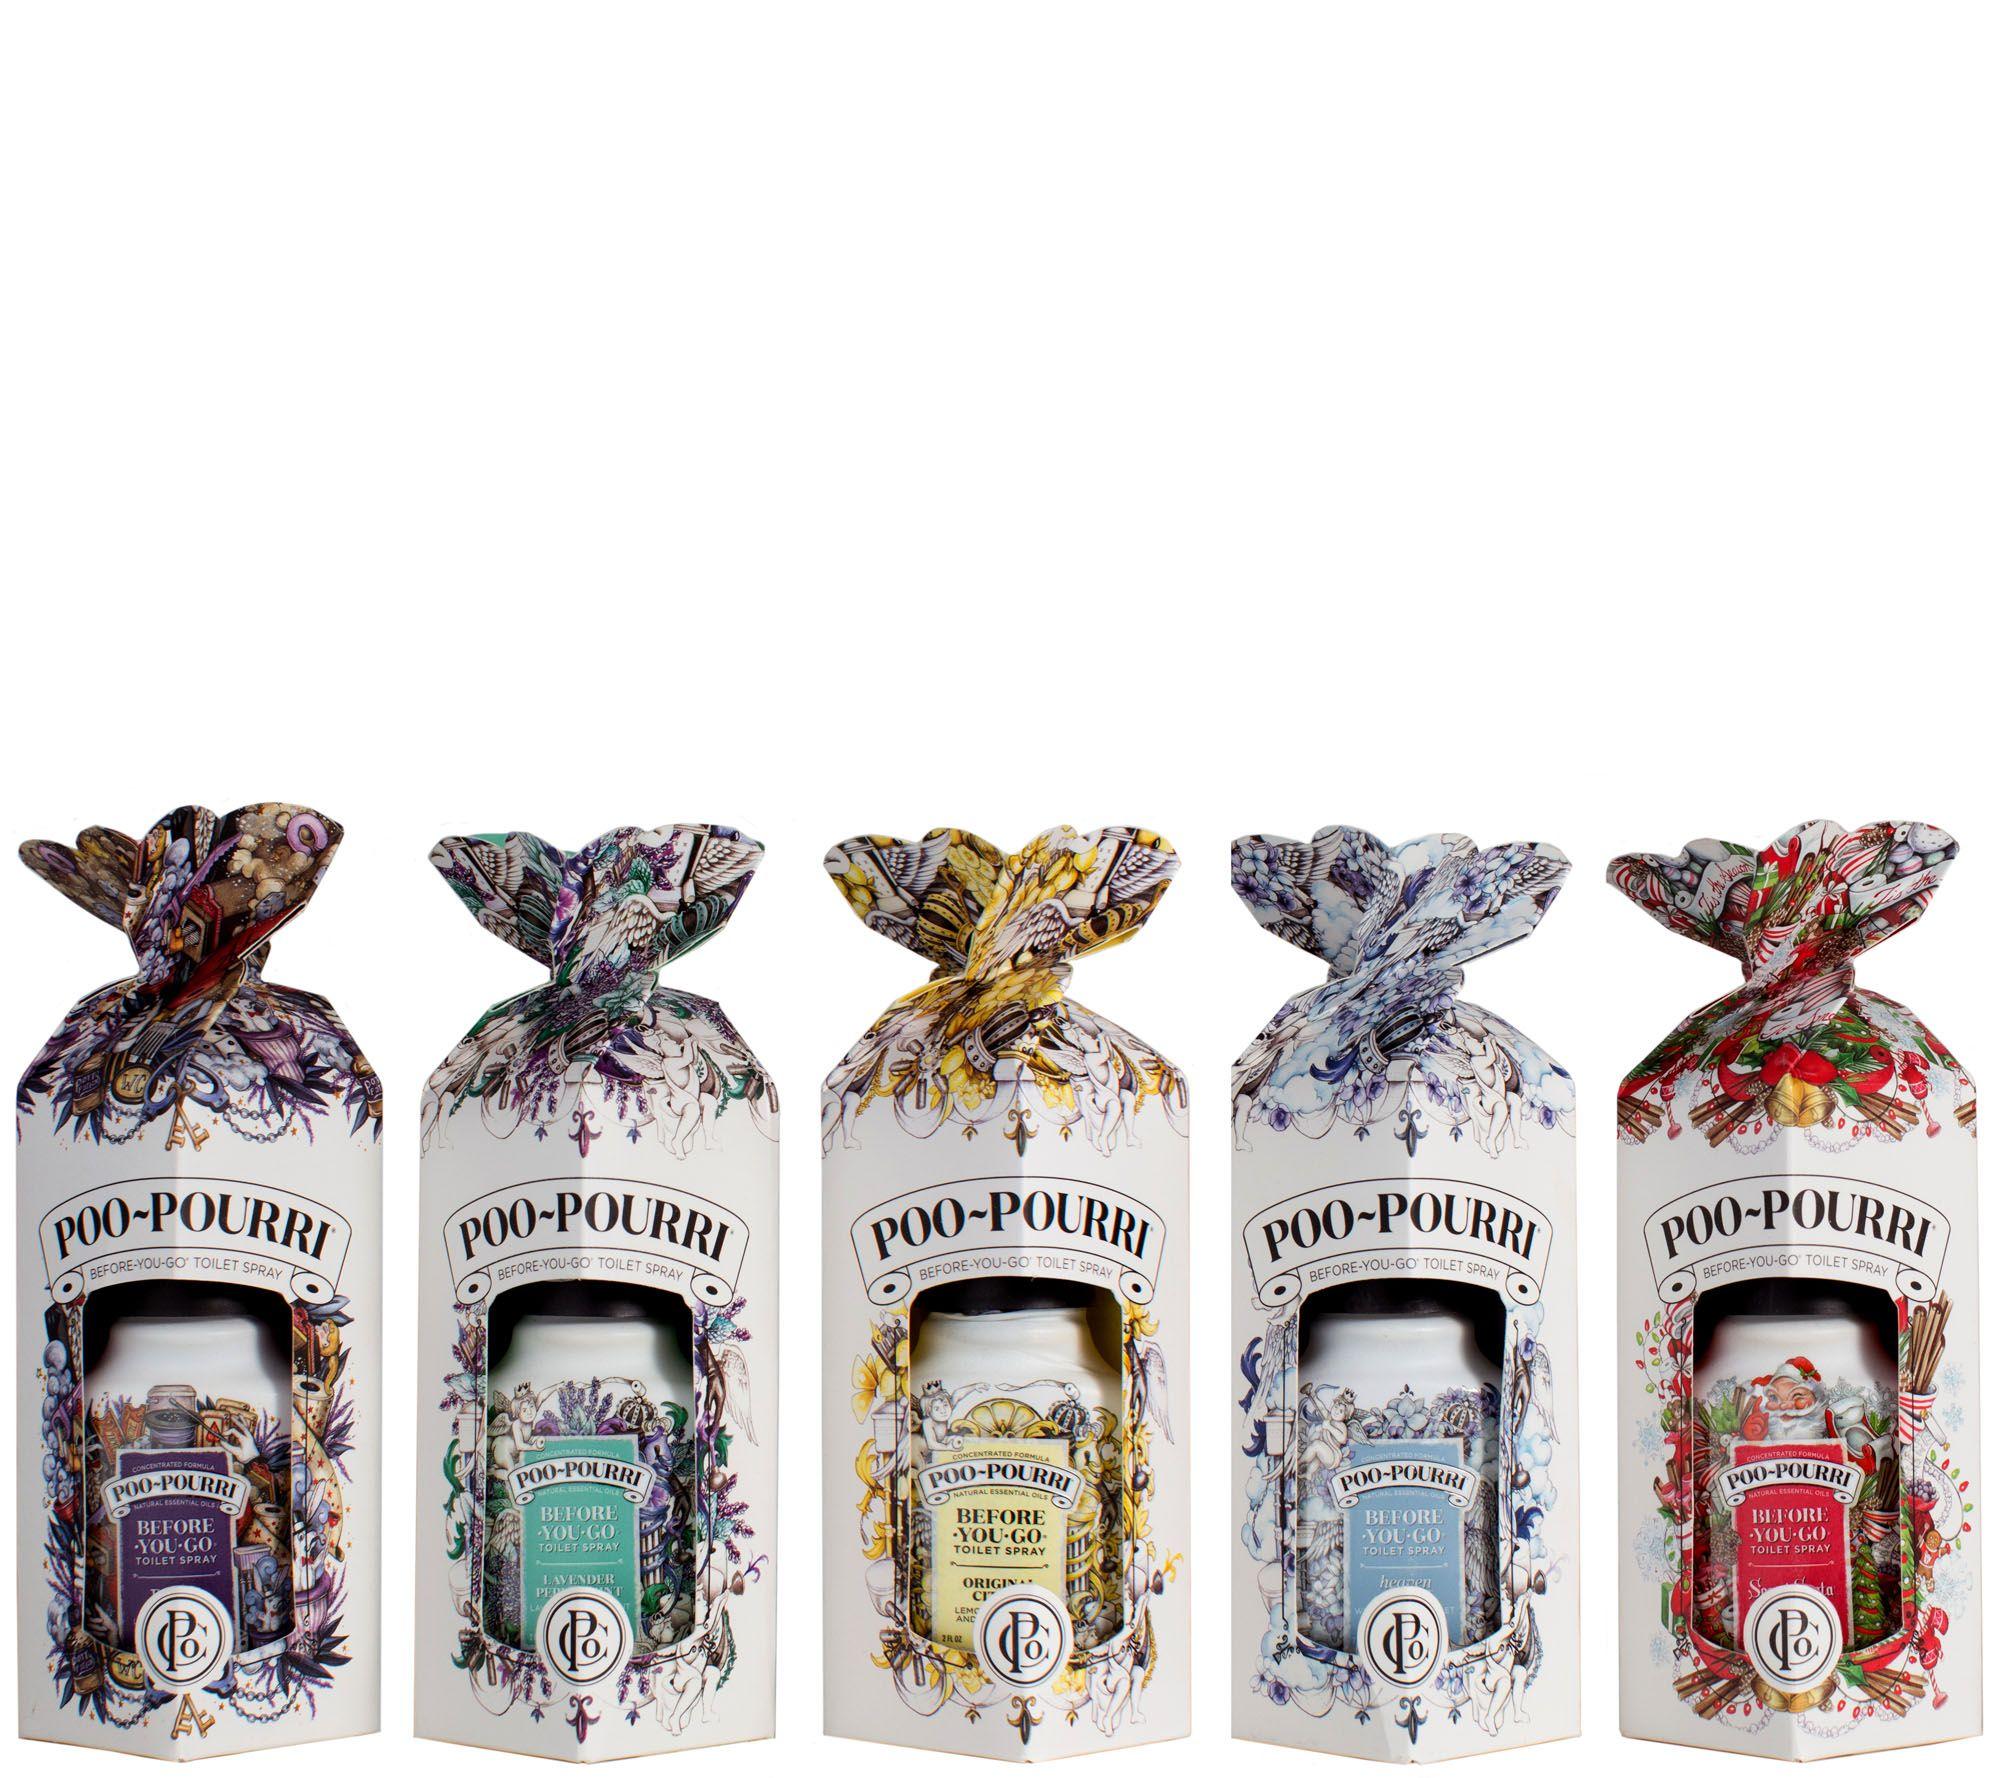 Poo-Pourri Set of 5 2 oz. Bathroom Deodorizers in Gift Boxes ...